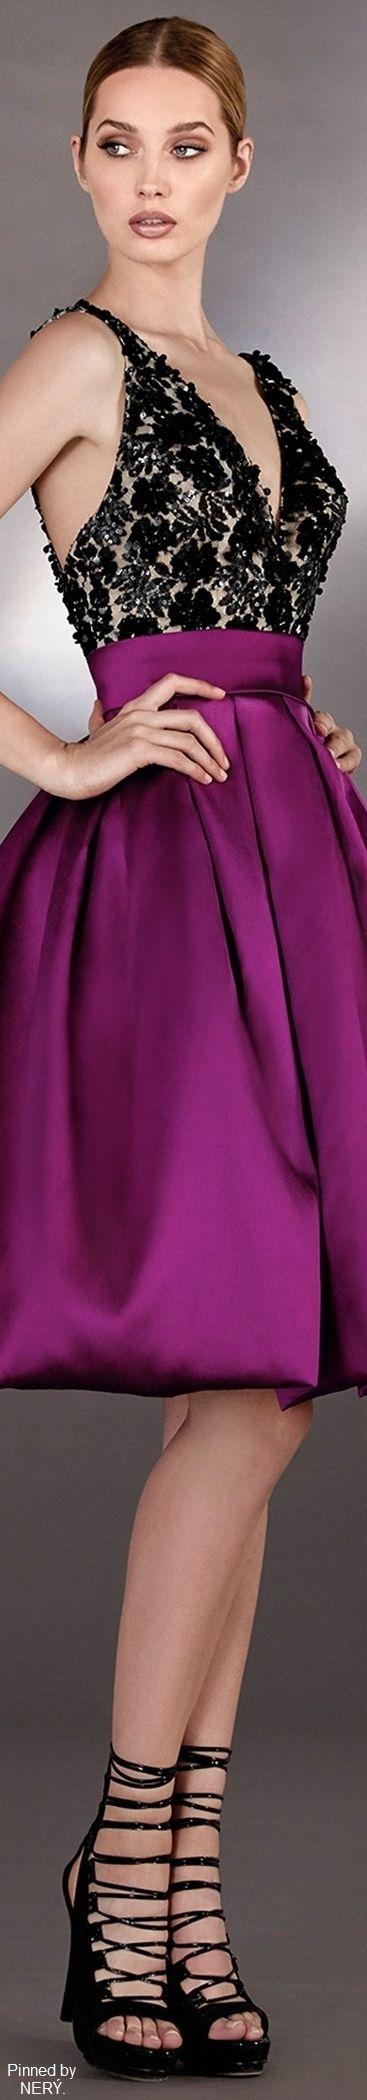 Hannibal Laguna Atelier Fiesta Collection 2017 | Vestido coctel ...